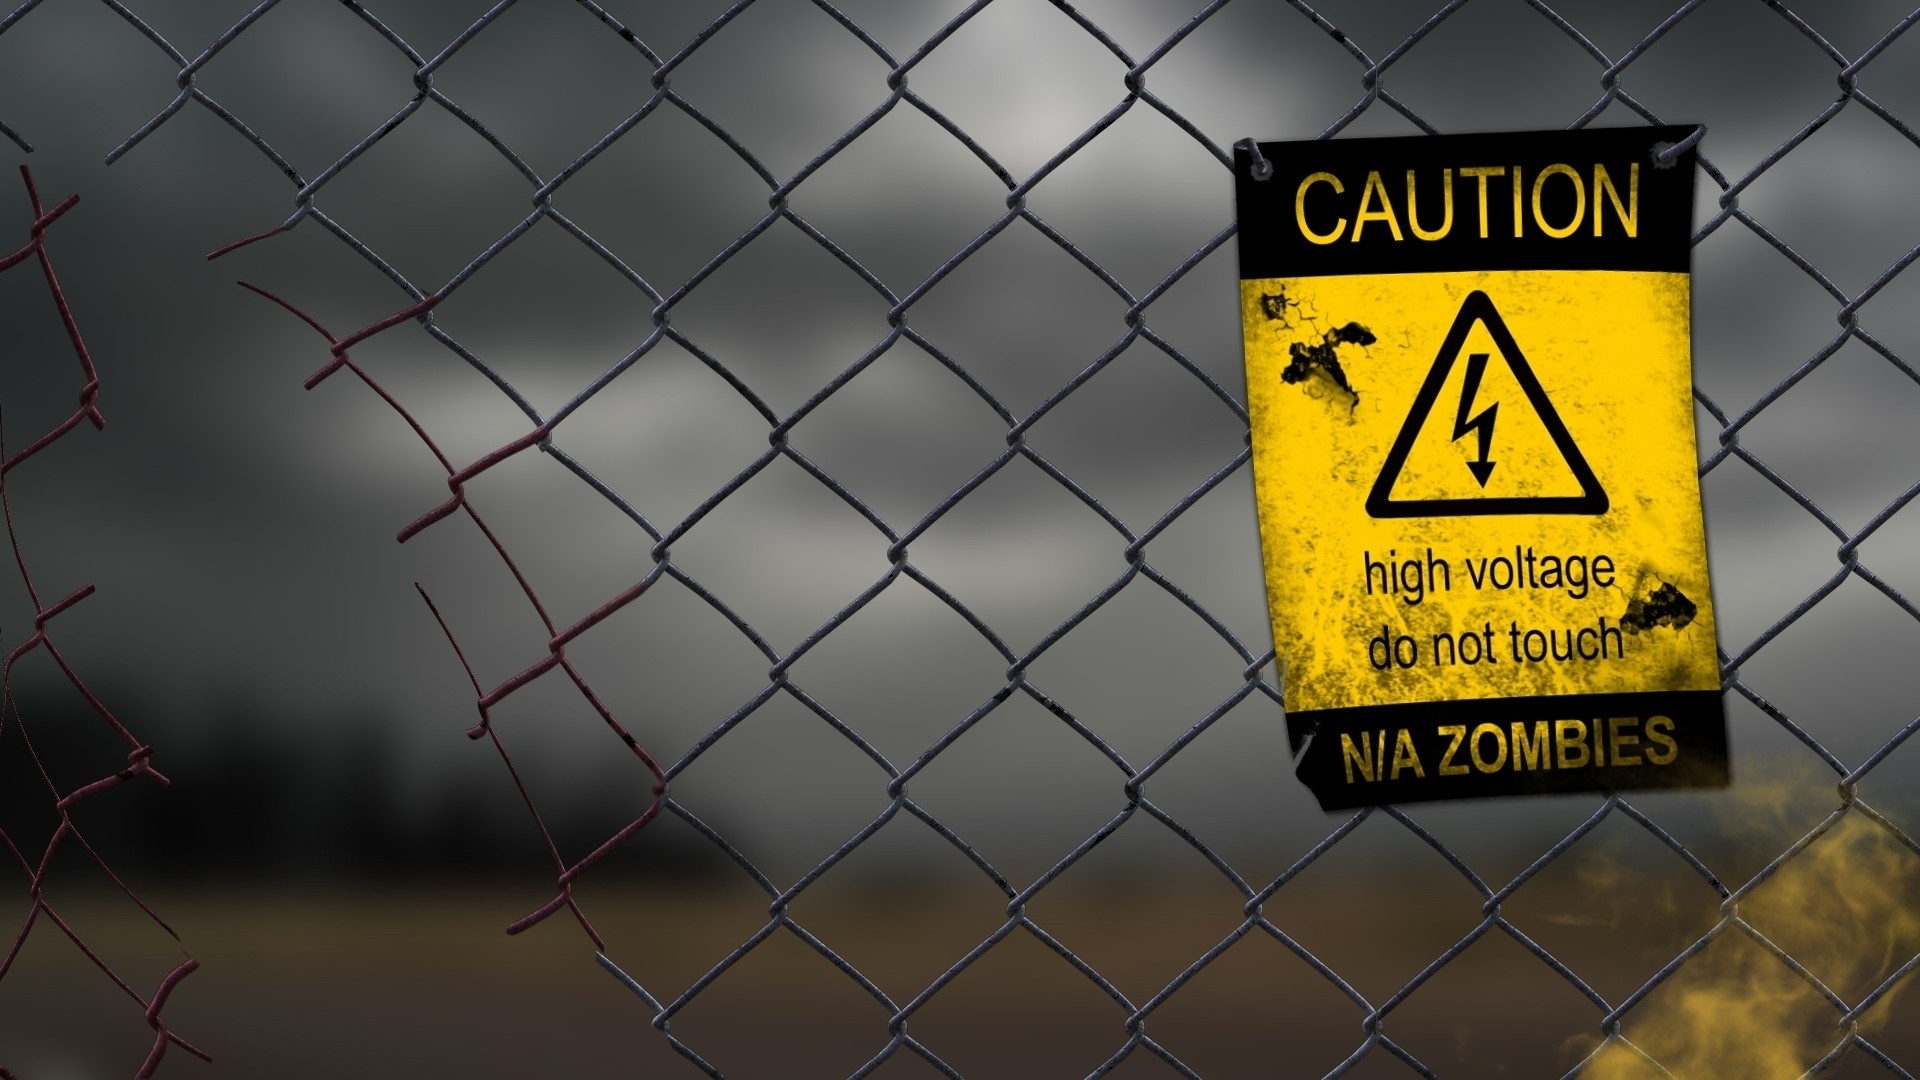 http://2.bp.blogspot.com/-DblmX6X_CC4/UHv-F2-upKI/AAAAAAAAMKo/OIylp6KWMtc/s0/zombies-warning-chain-link-fence-apocalyptic-high-voltage-1920x1080.jpg